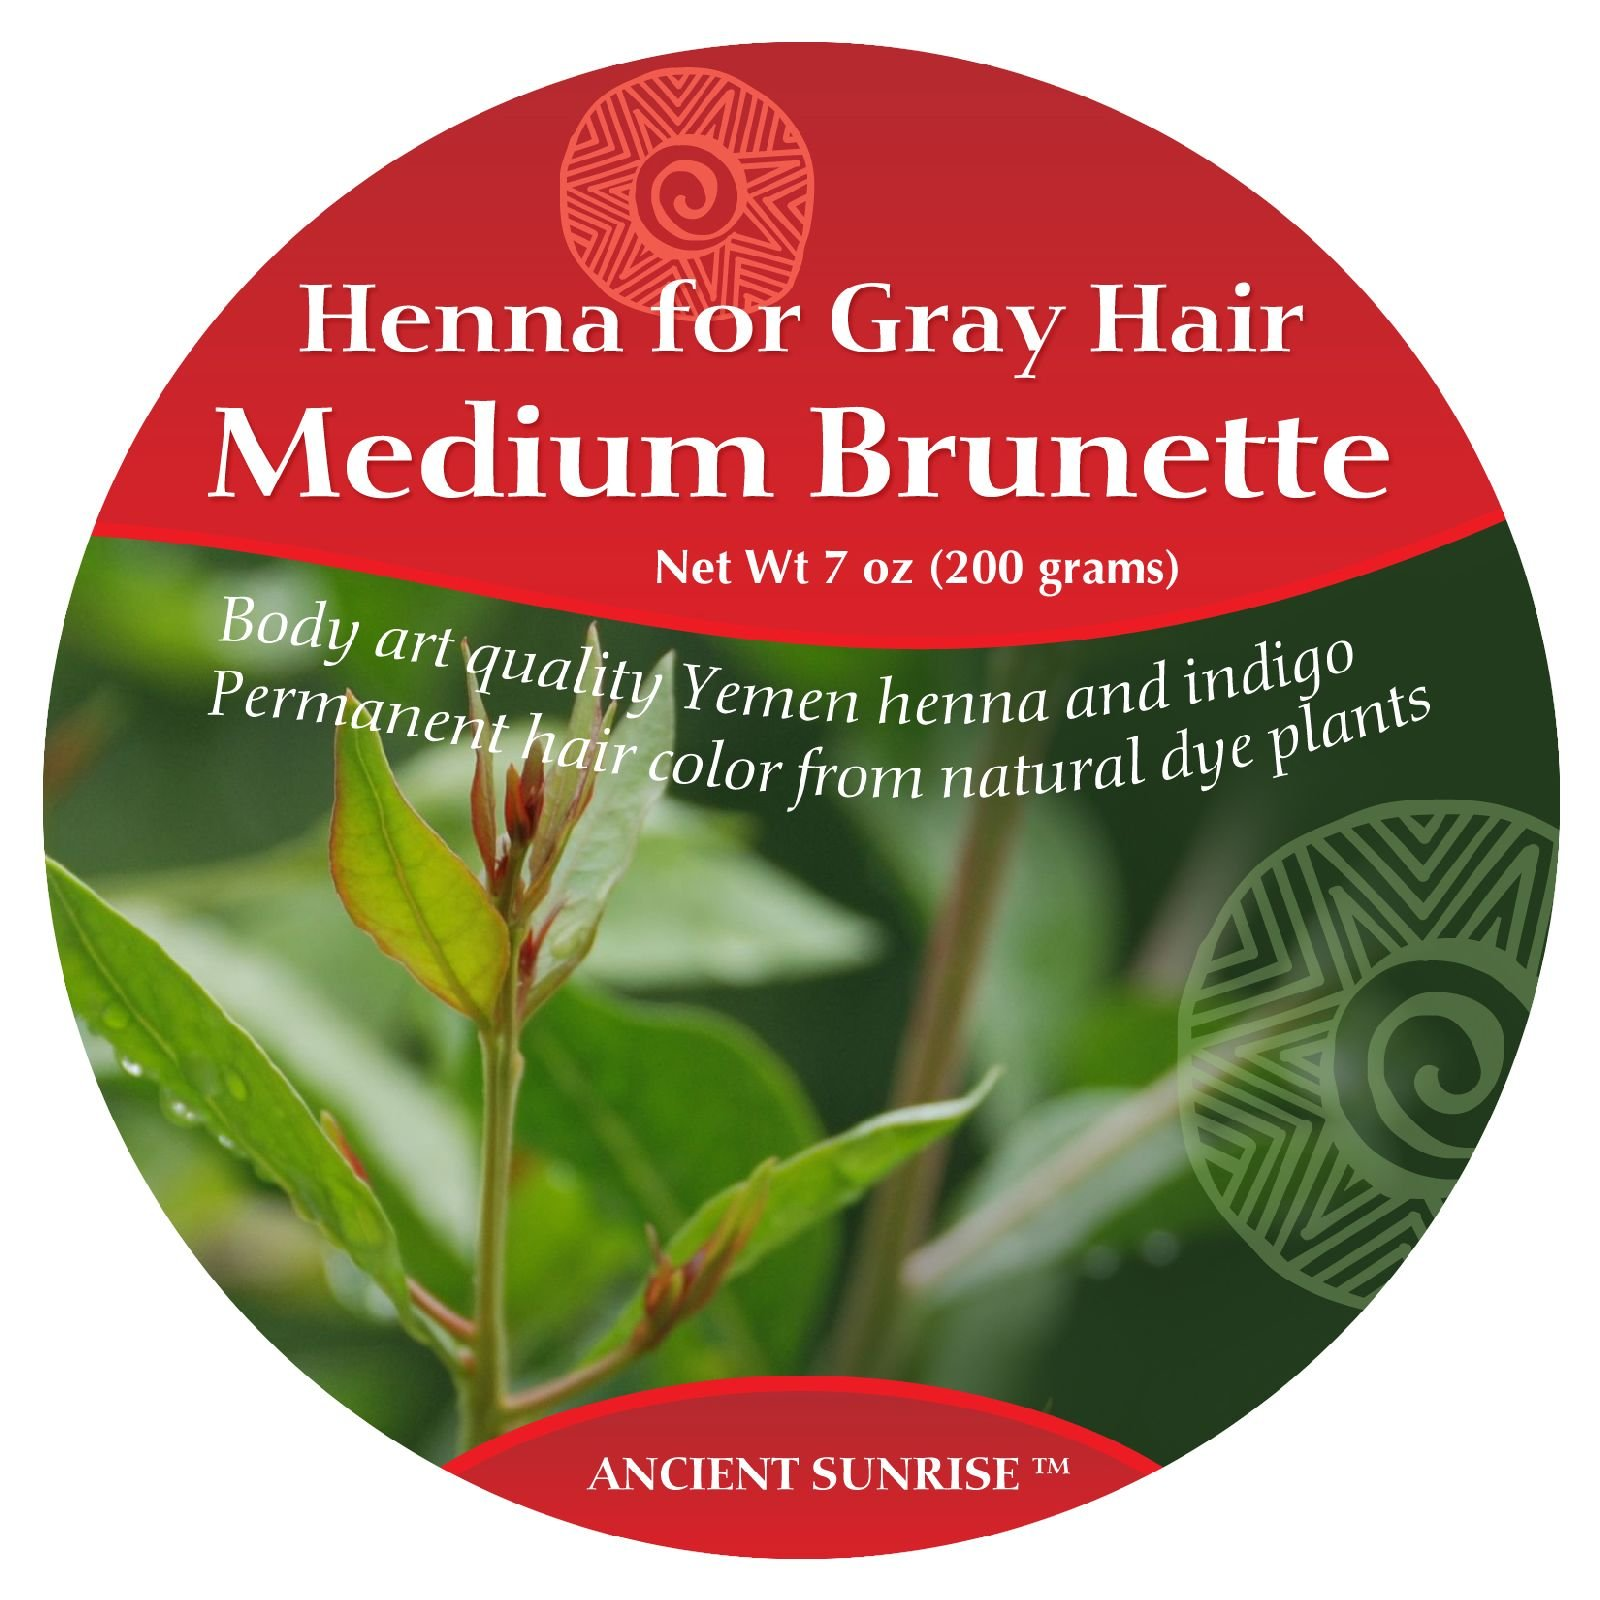 Ancient Sunrise Henna For Gray Hair Medium Brunette Kit by Ancient Sunrise